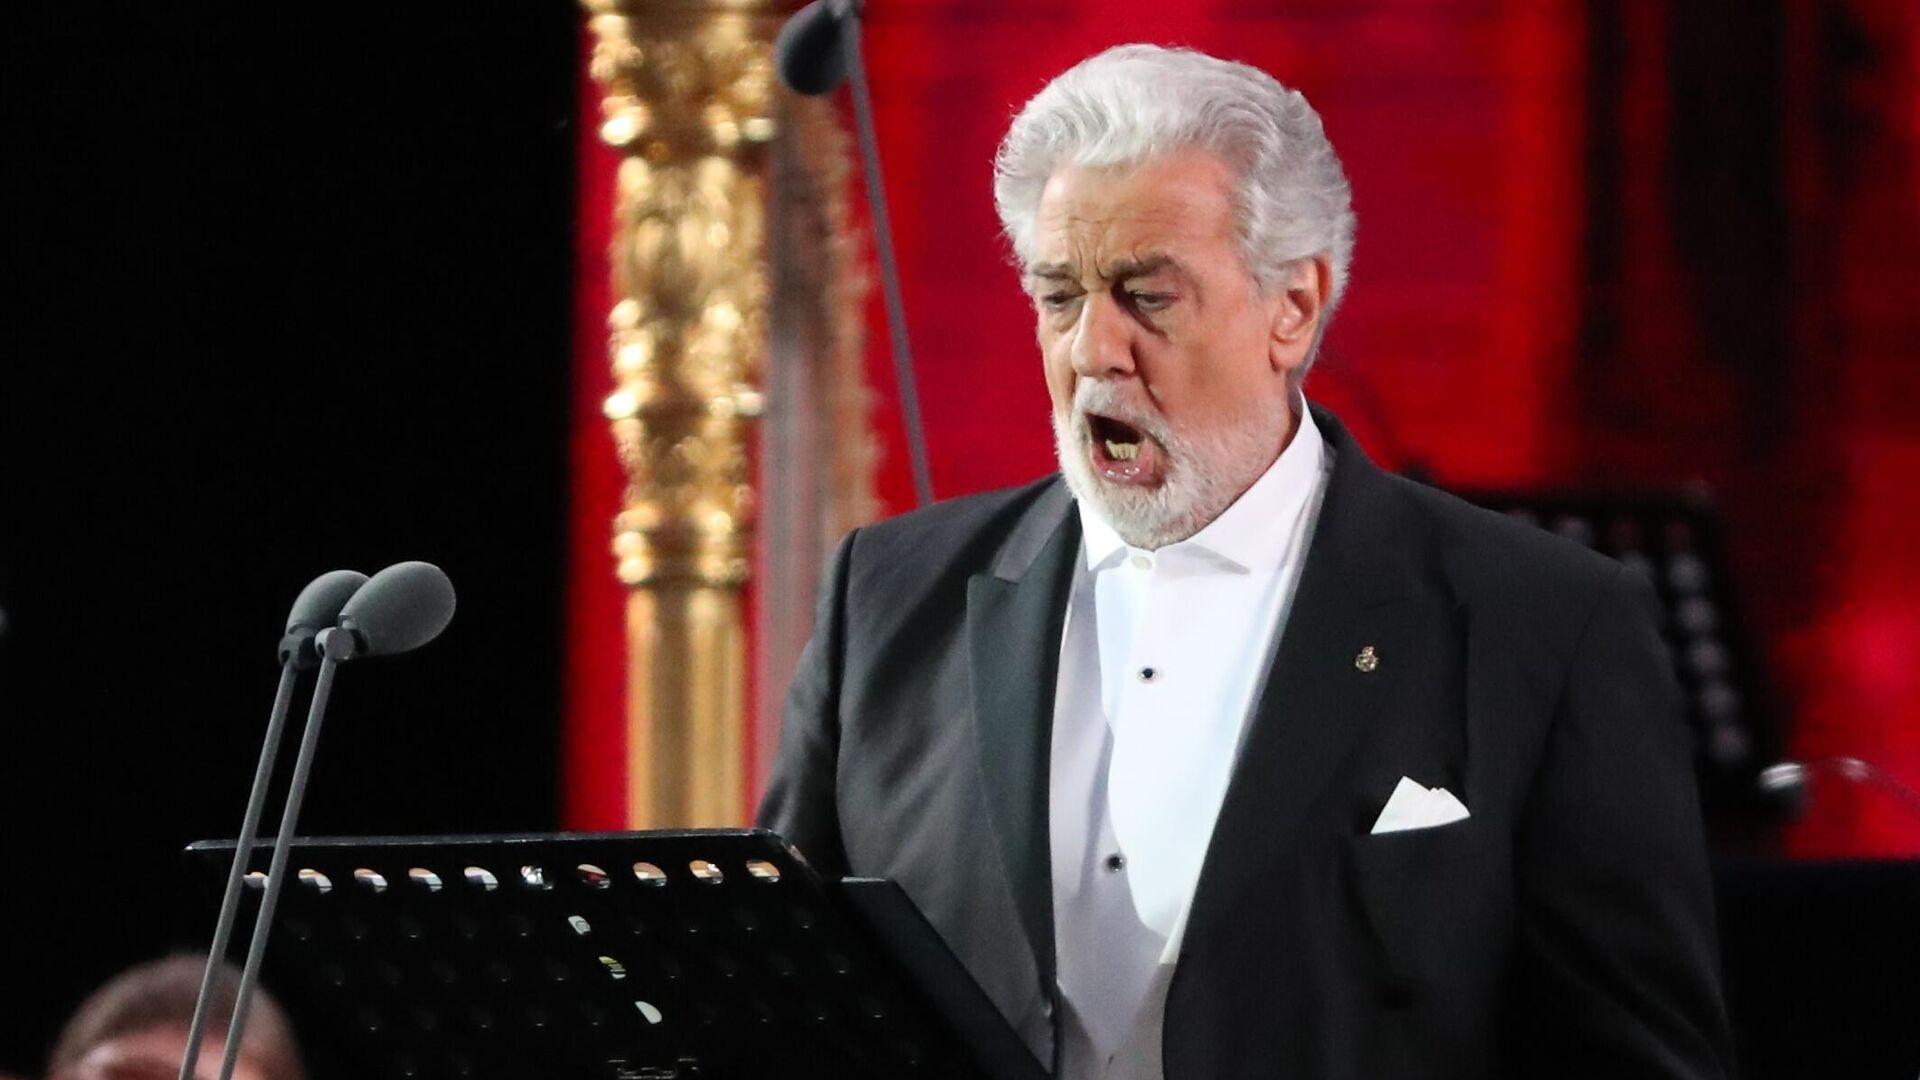 Испанский оперный певец Пласидо Доминго - РИА Новости, 1920, 15.10.2019